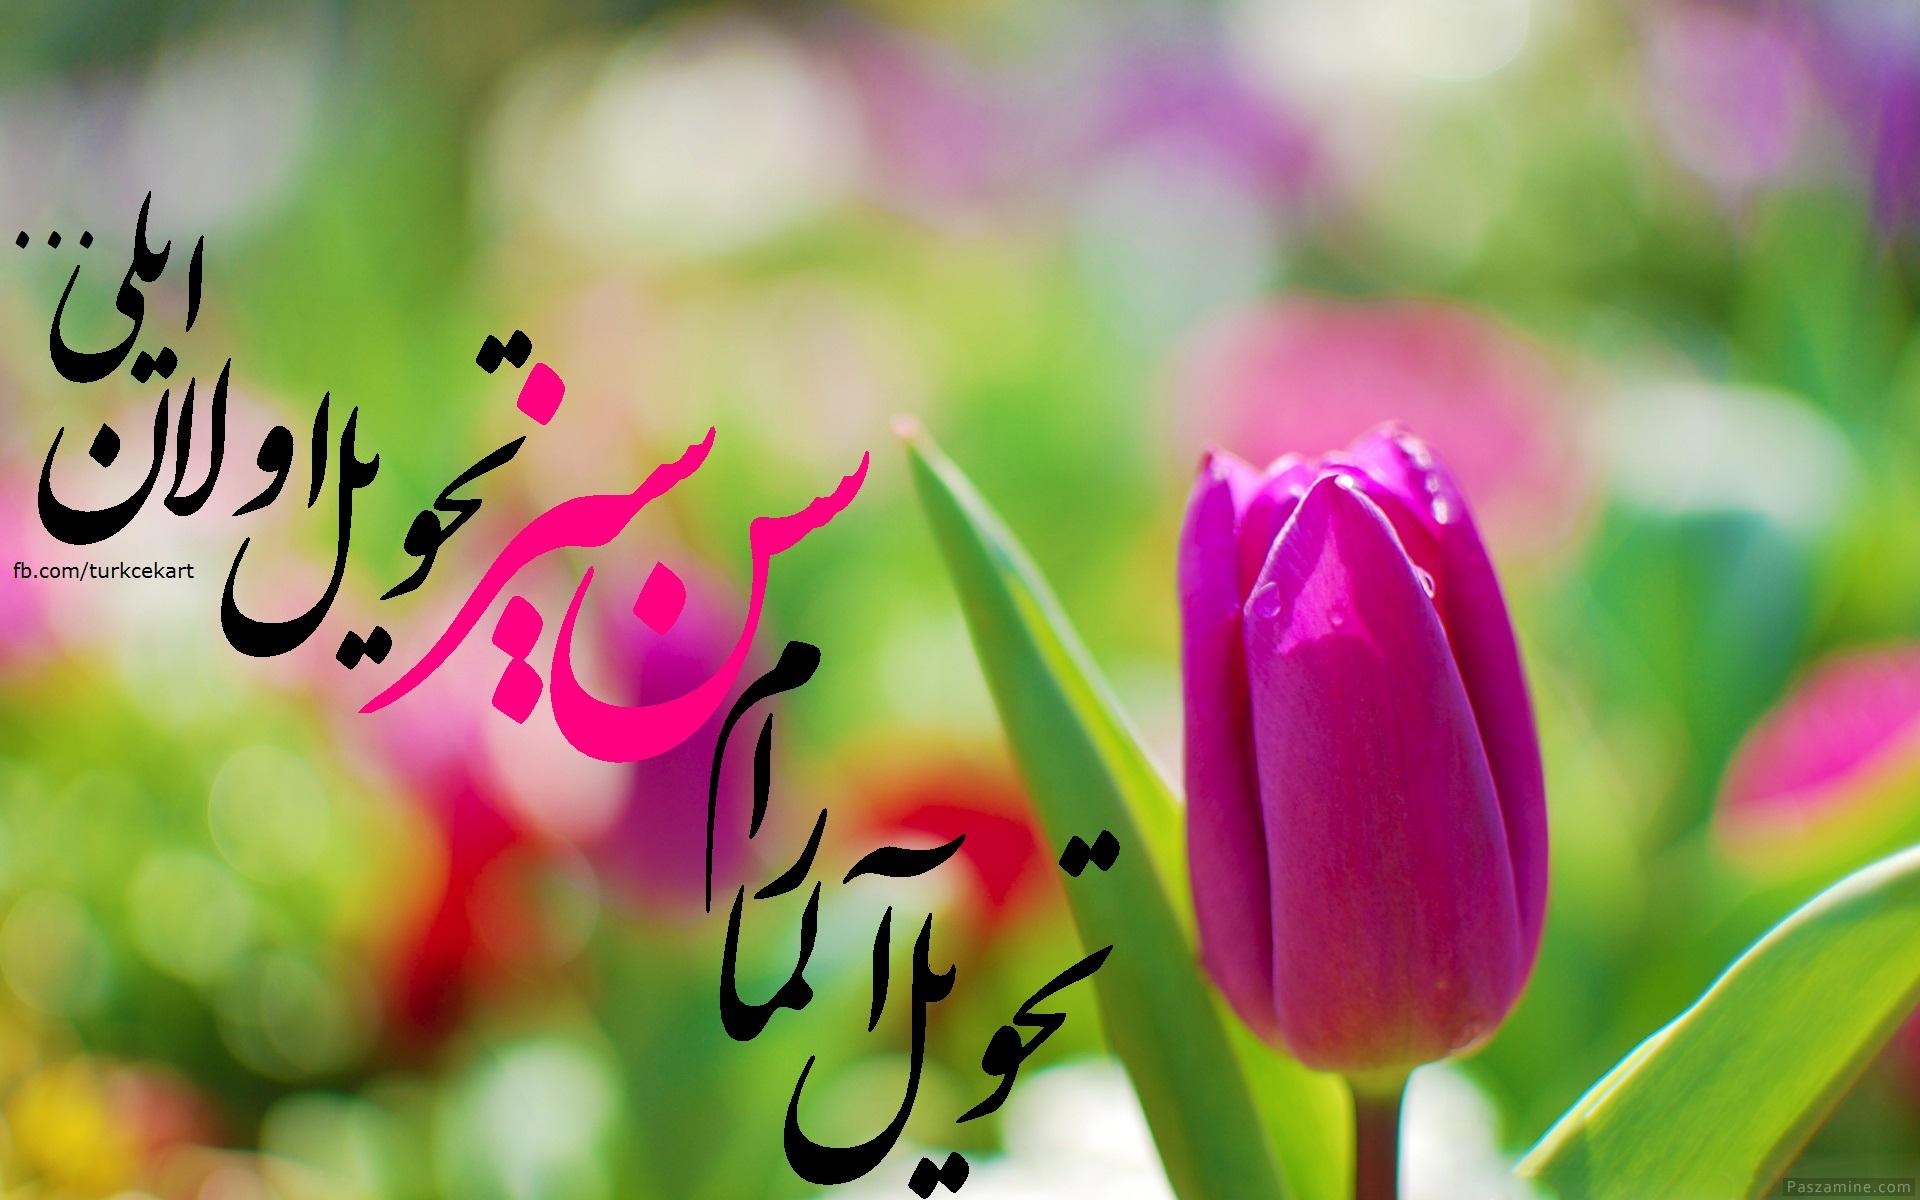 http://aharimiz.arzublog.com/uploads/aharimiz/yeni_il.jpg